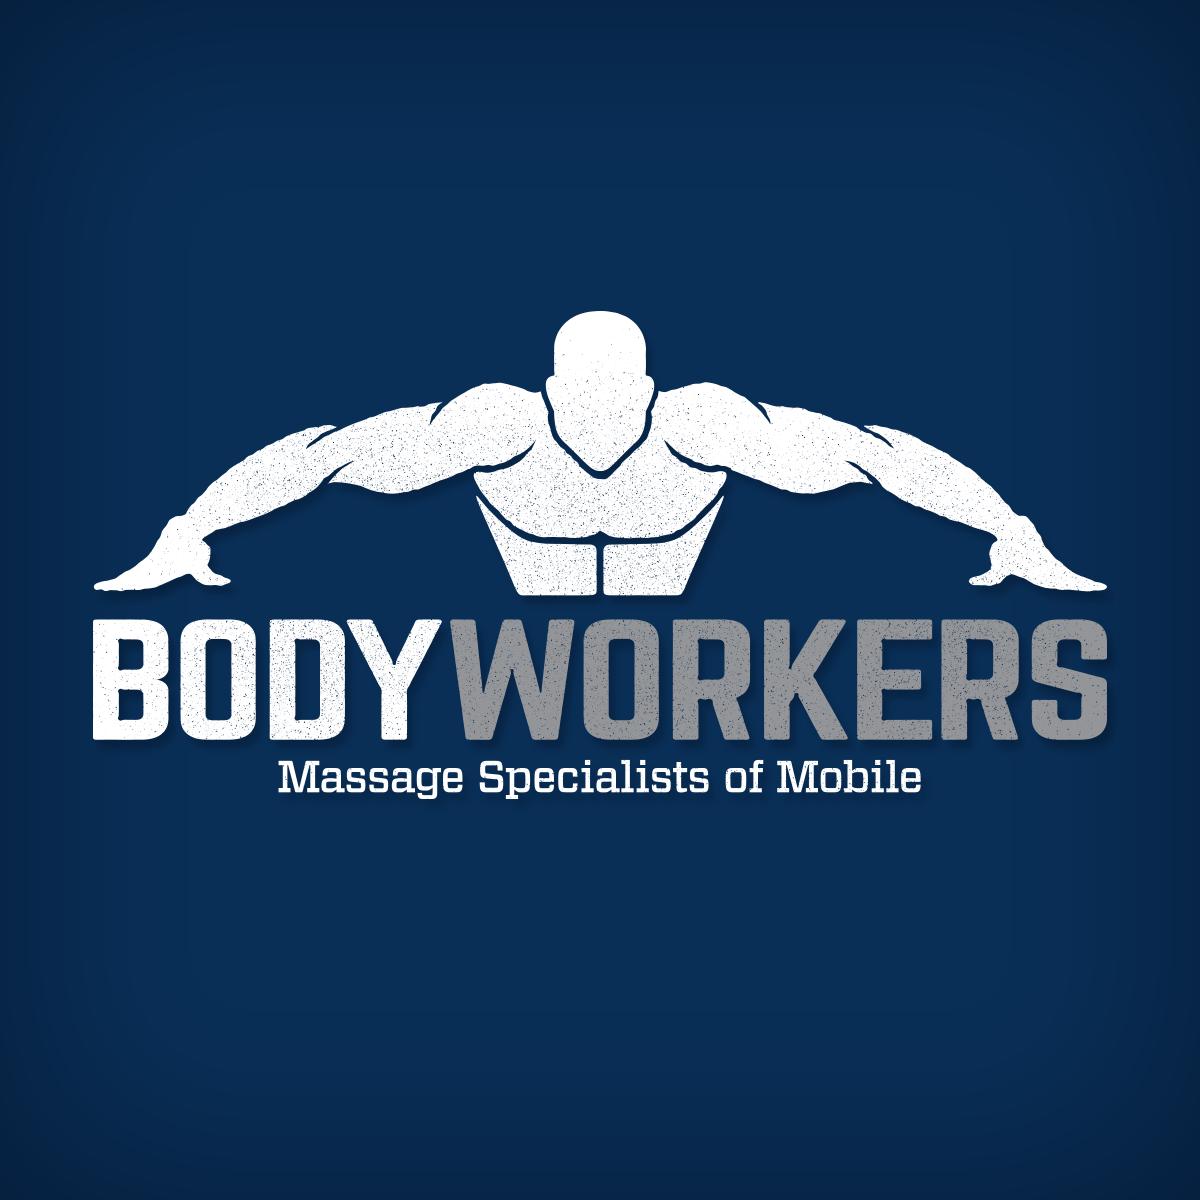 BodyWorkers